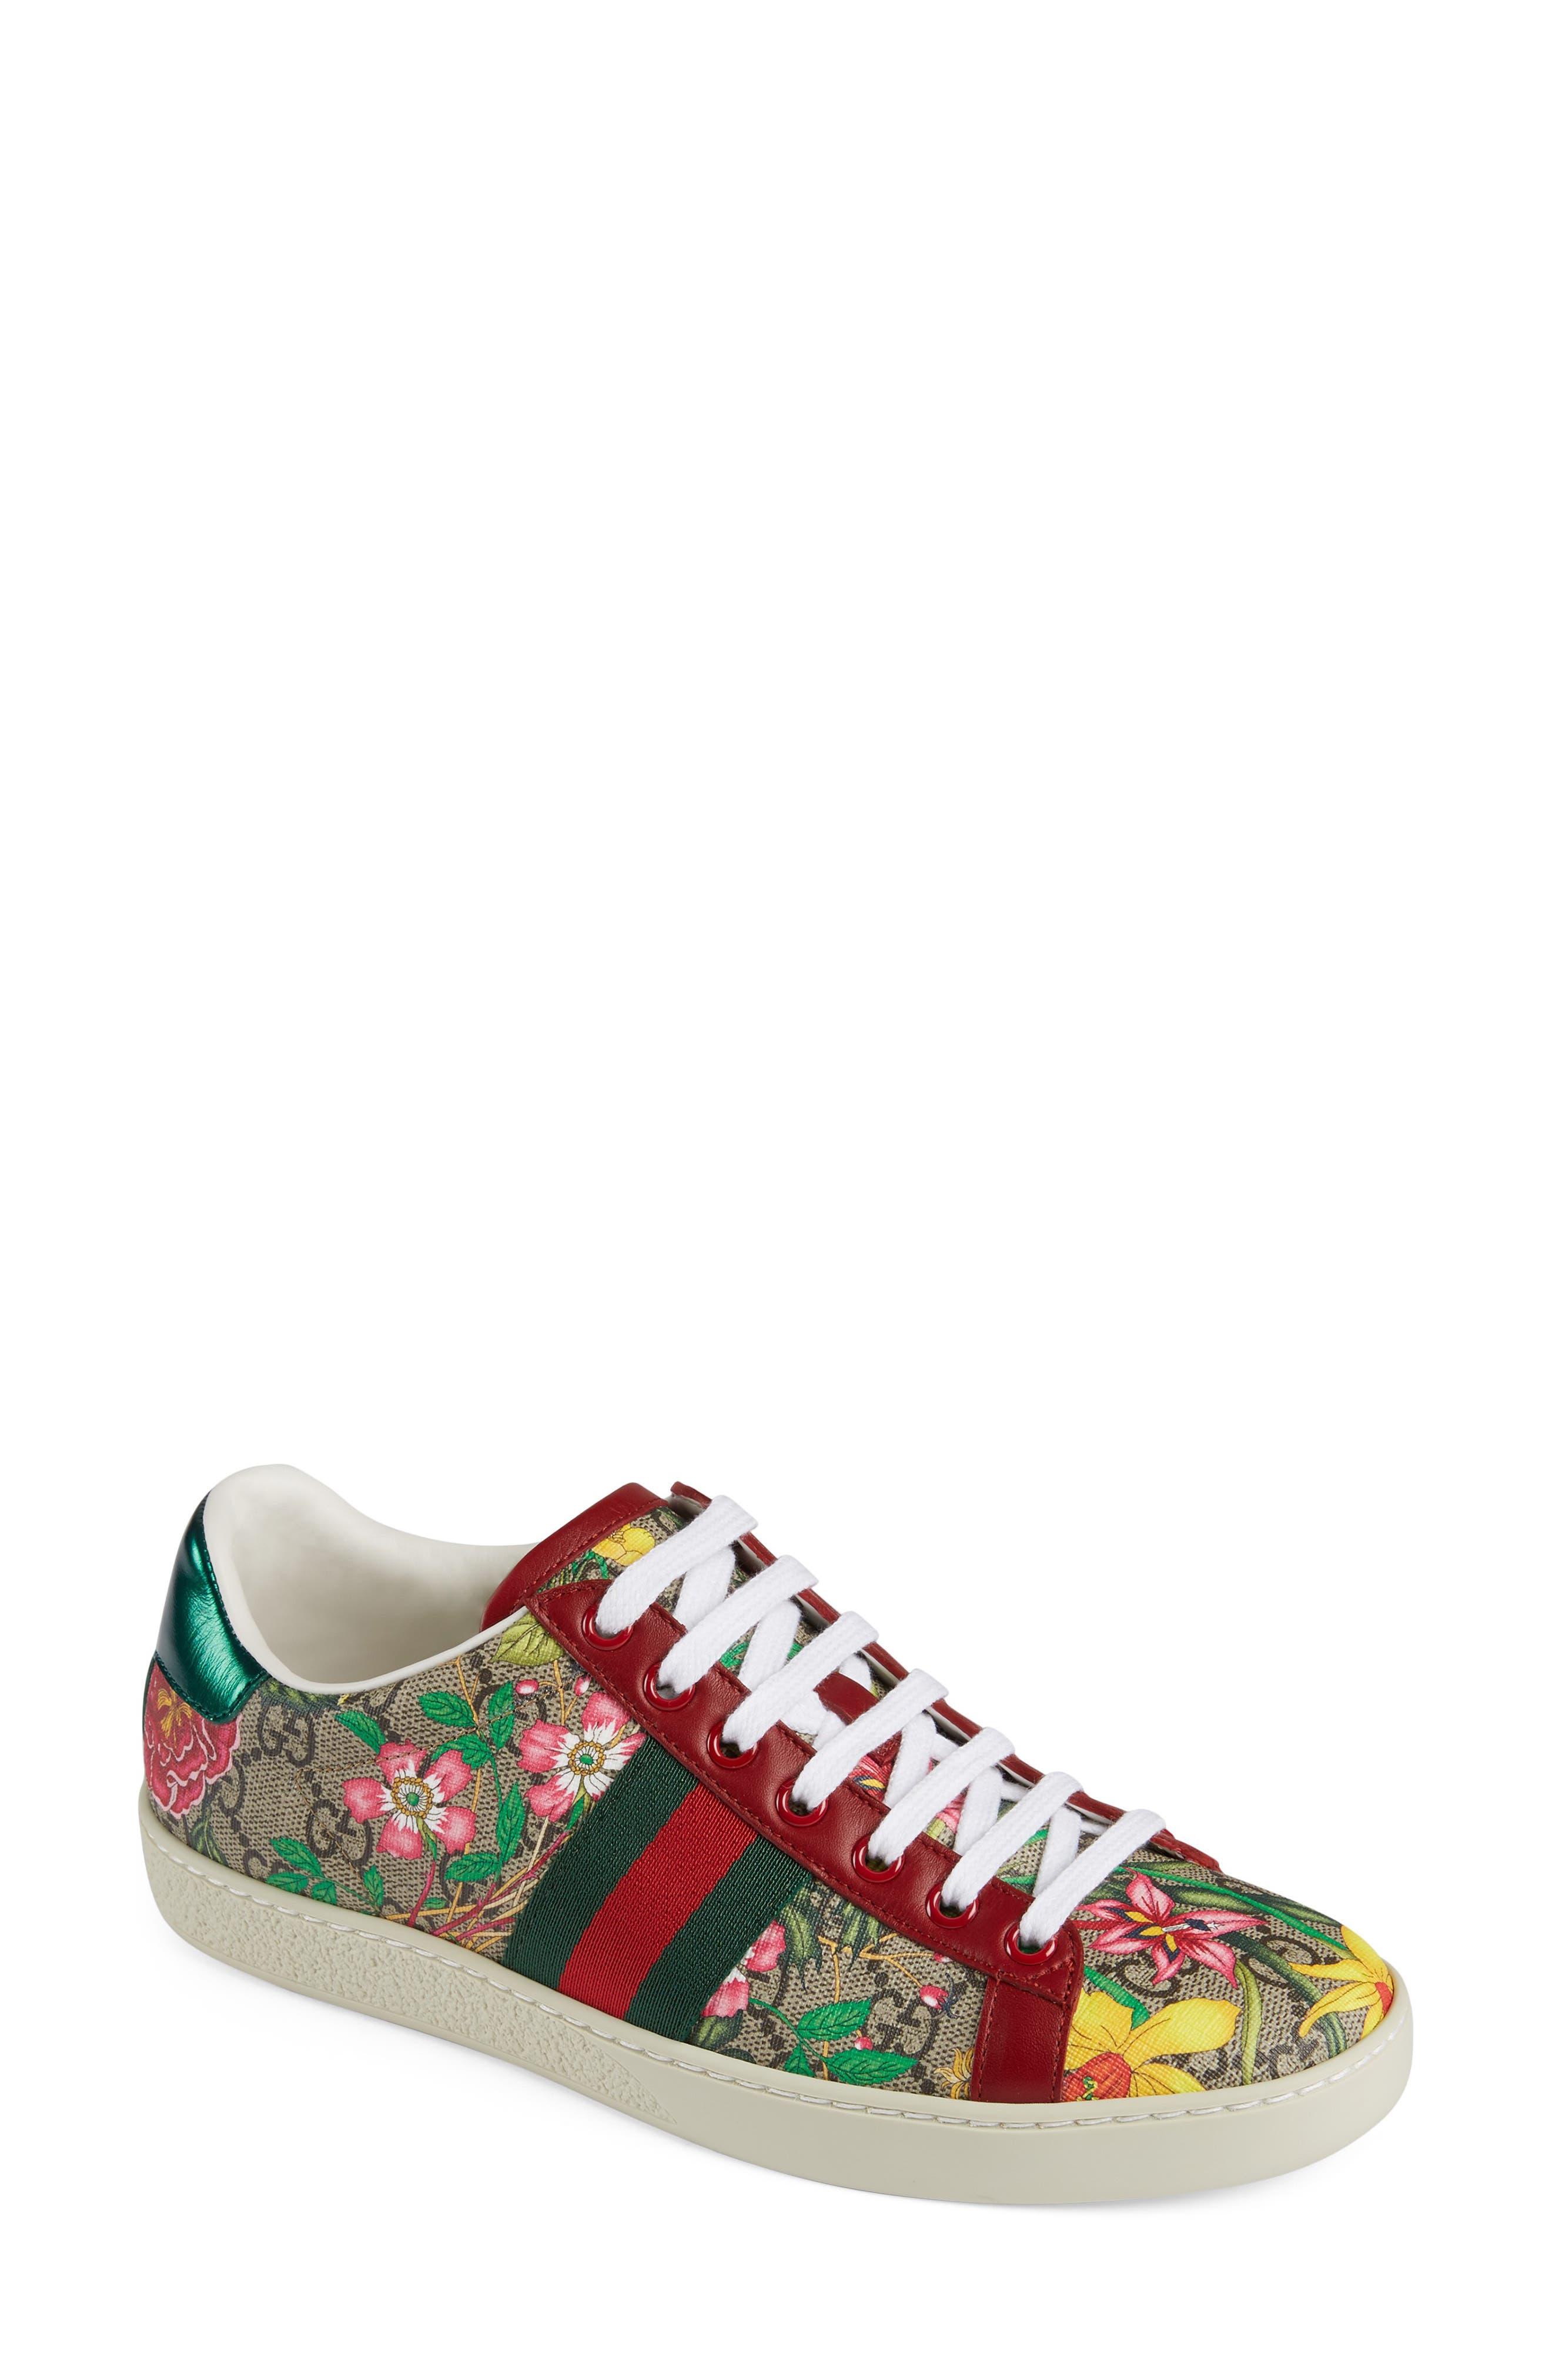 Gucci New Ace GG Supreme Floral Sneaker